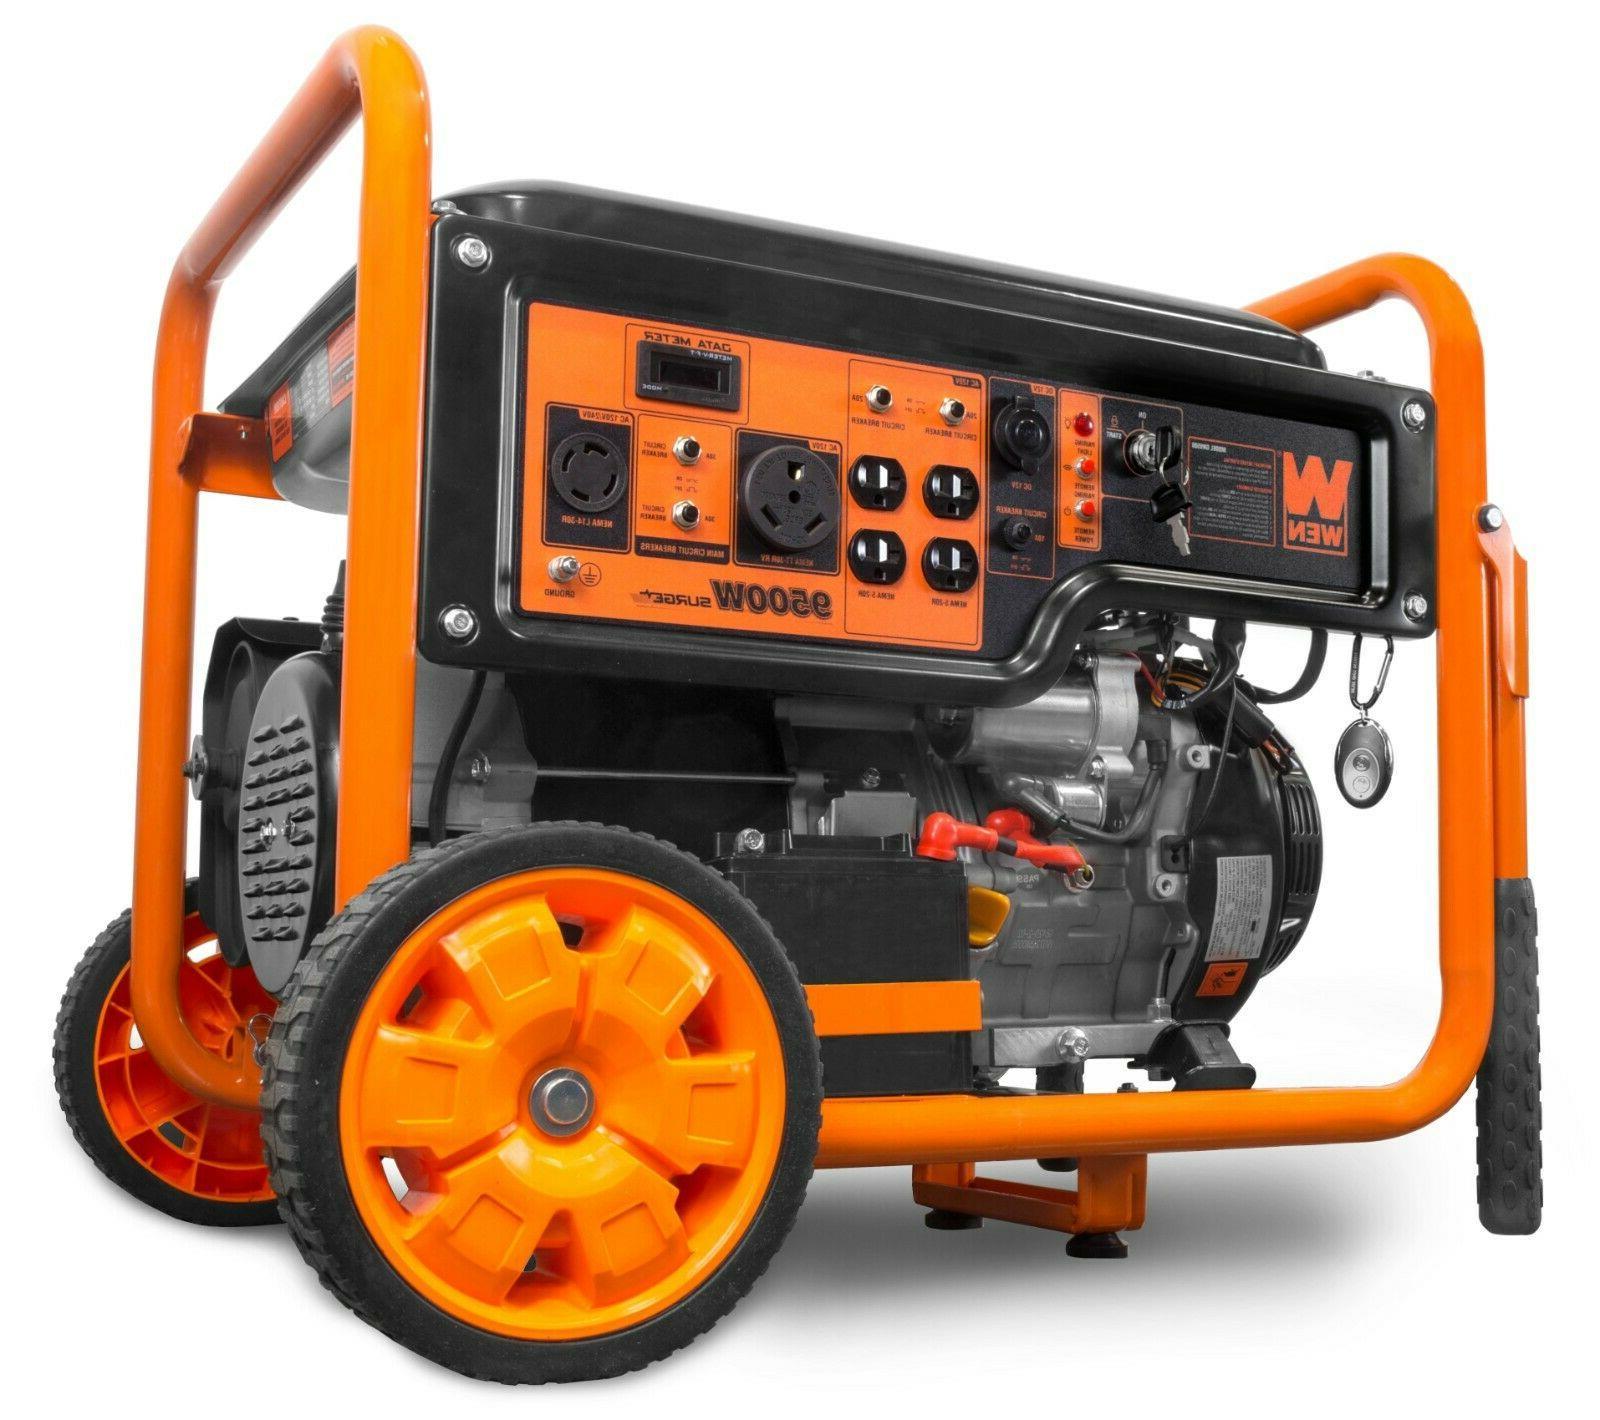 WEN 420cc Transfer Ready Portable Generator